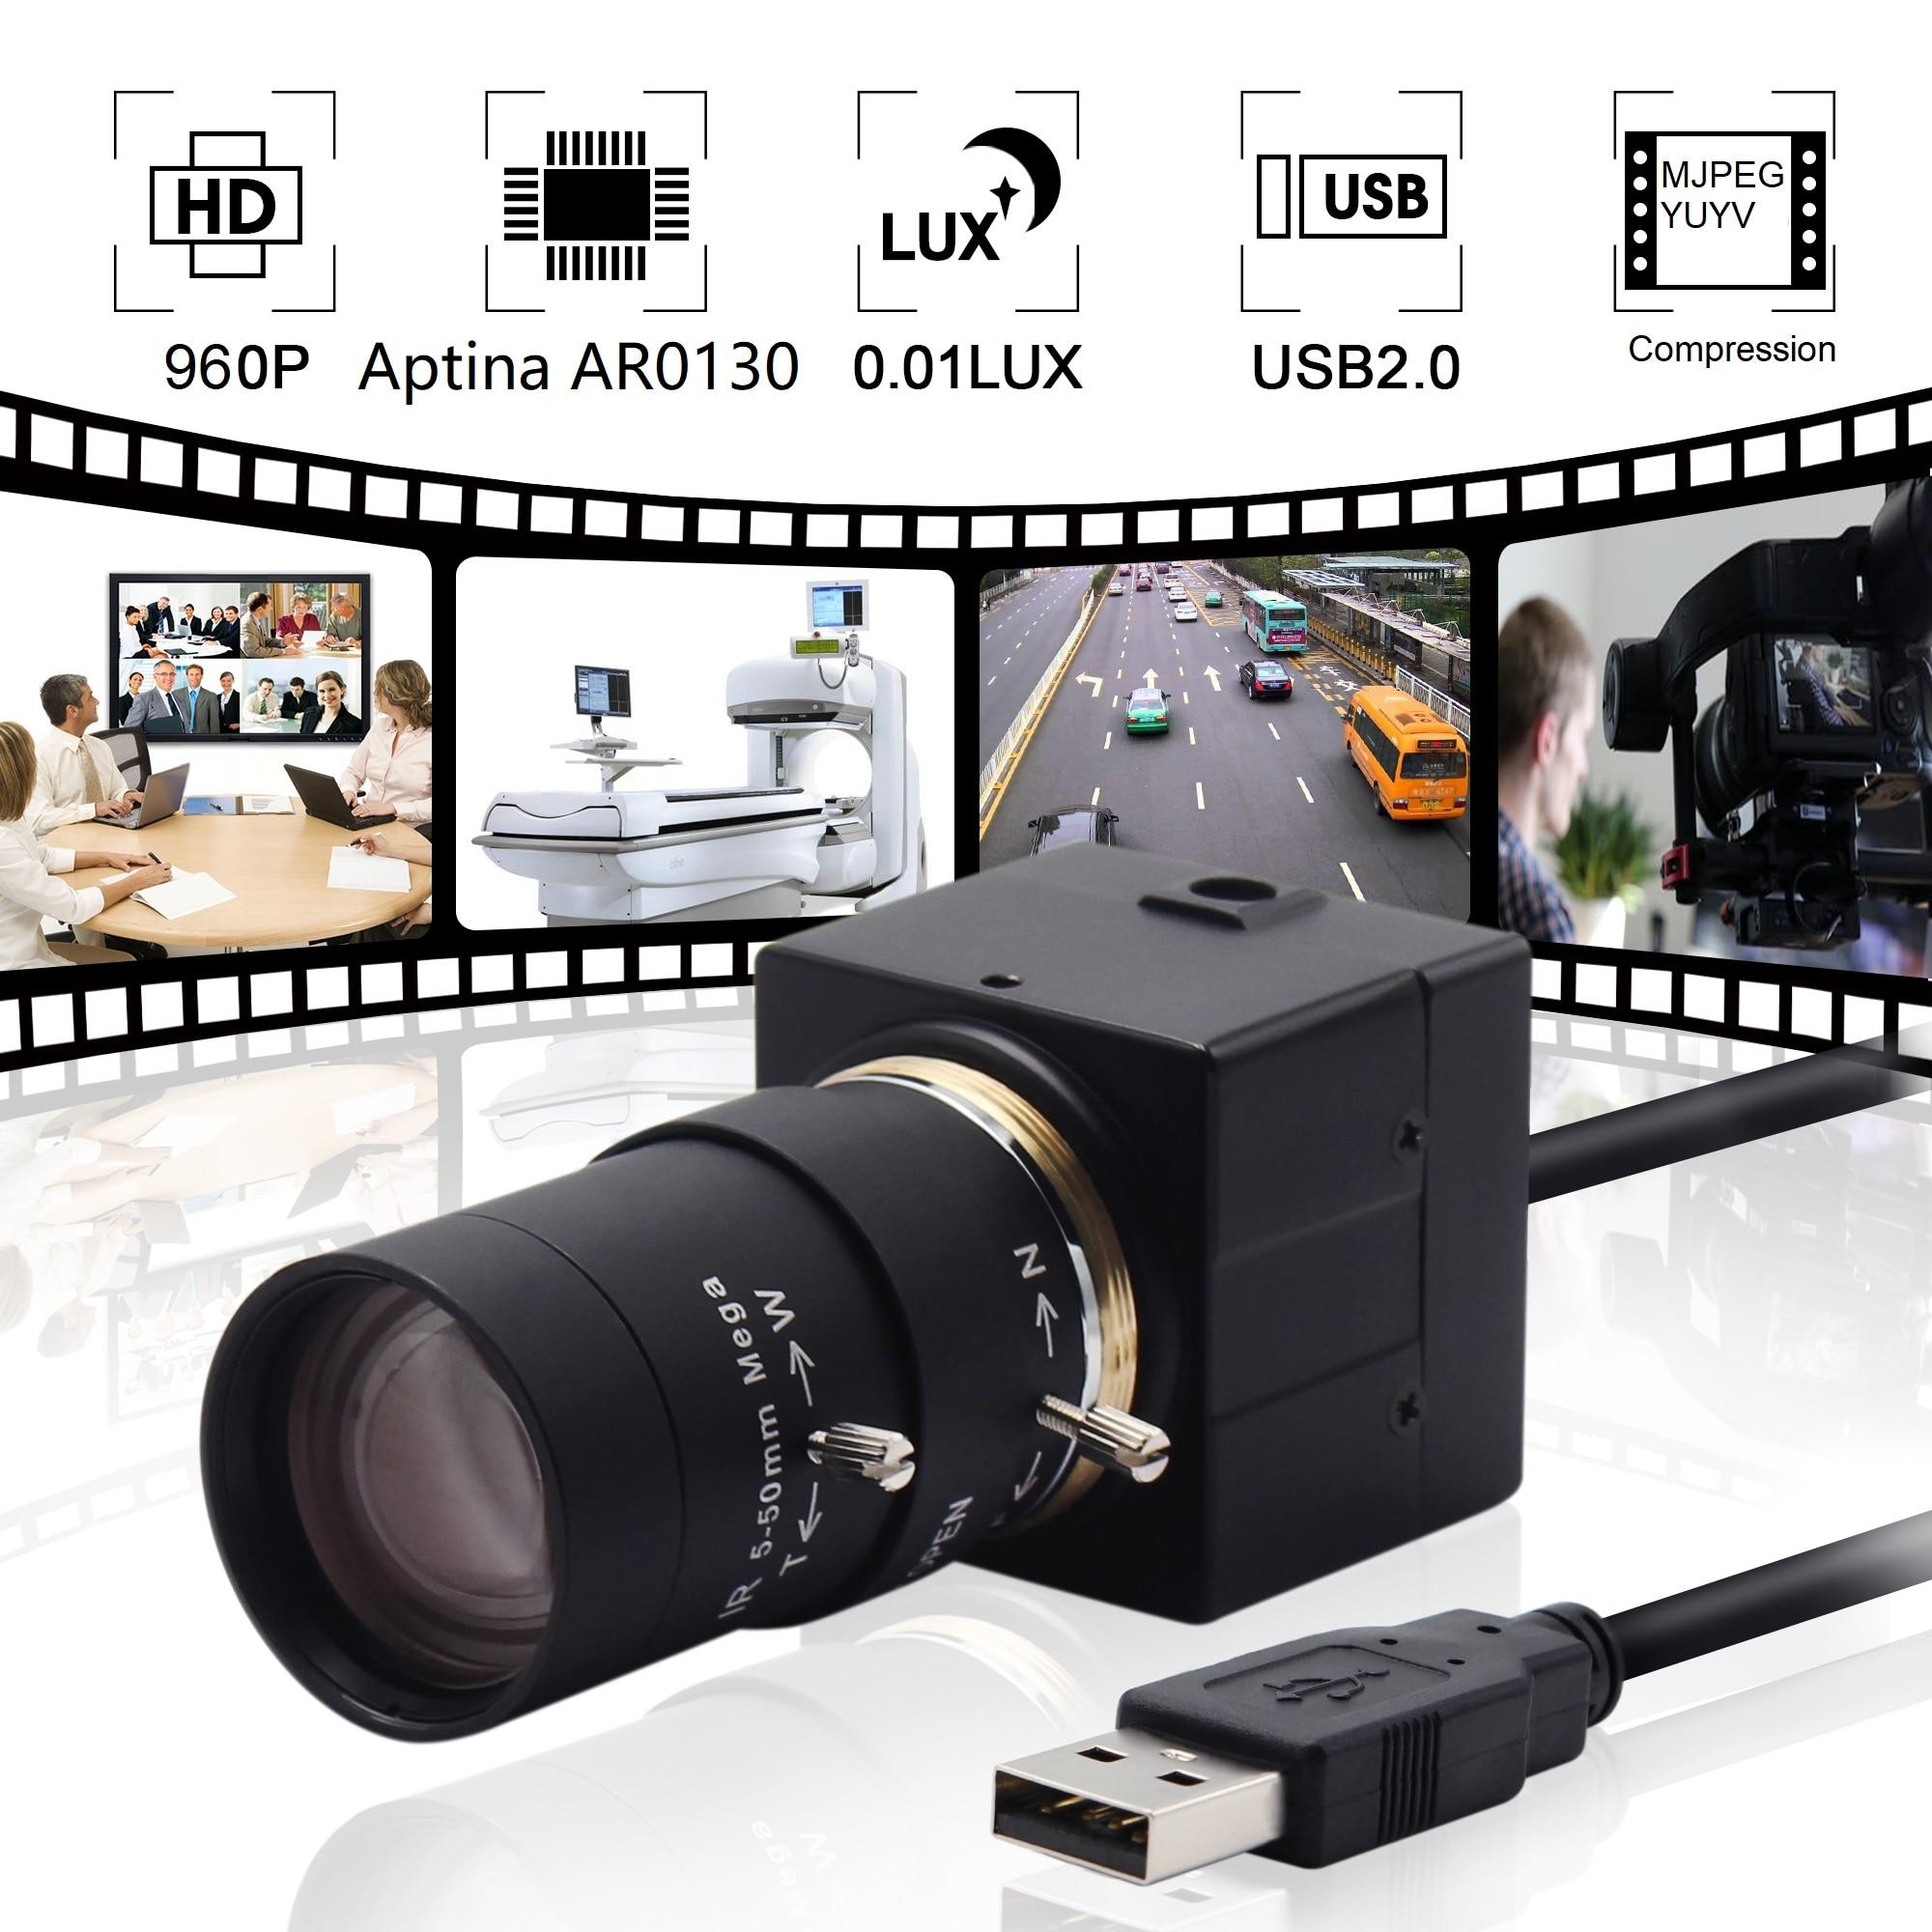 960P AR0130 1/3 CMOS Sensor 0.01Lux Low Illumination Mini USB Camera HD With 2.8-12mm Varifocal Lens For Astronomy Telescope